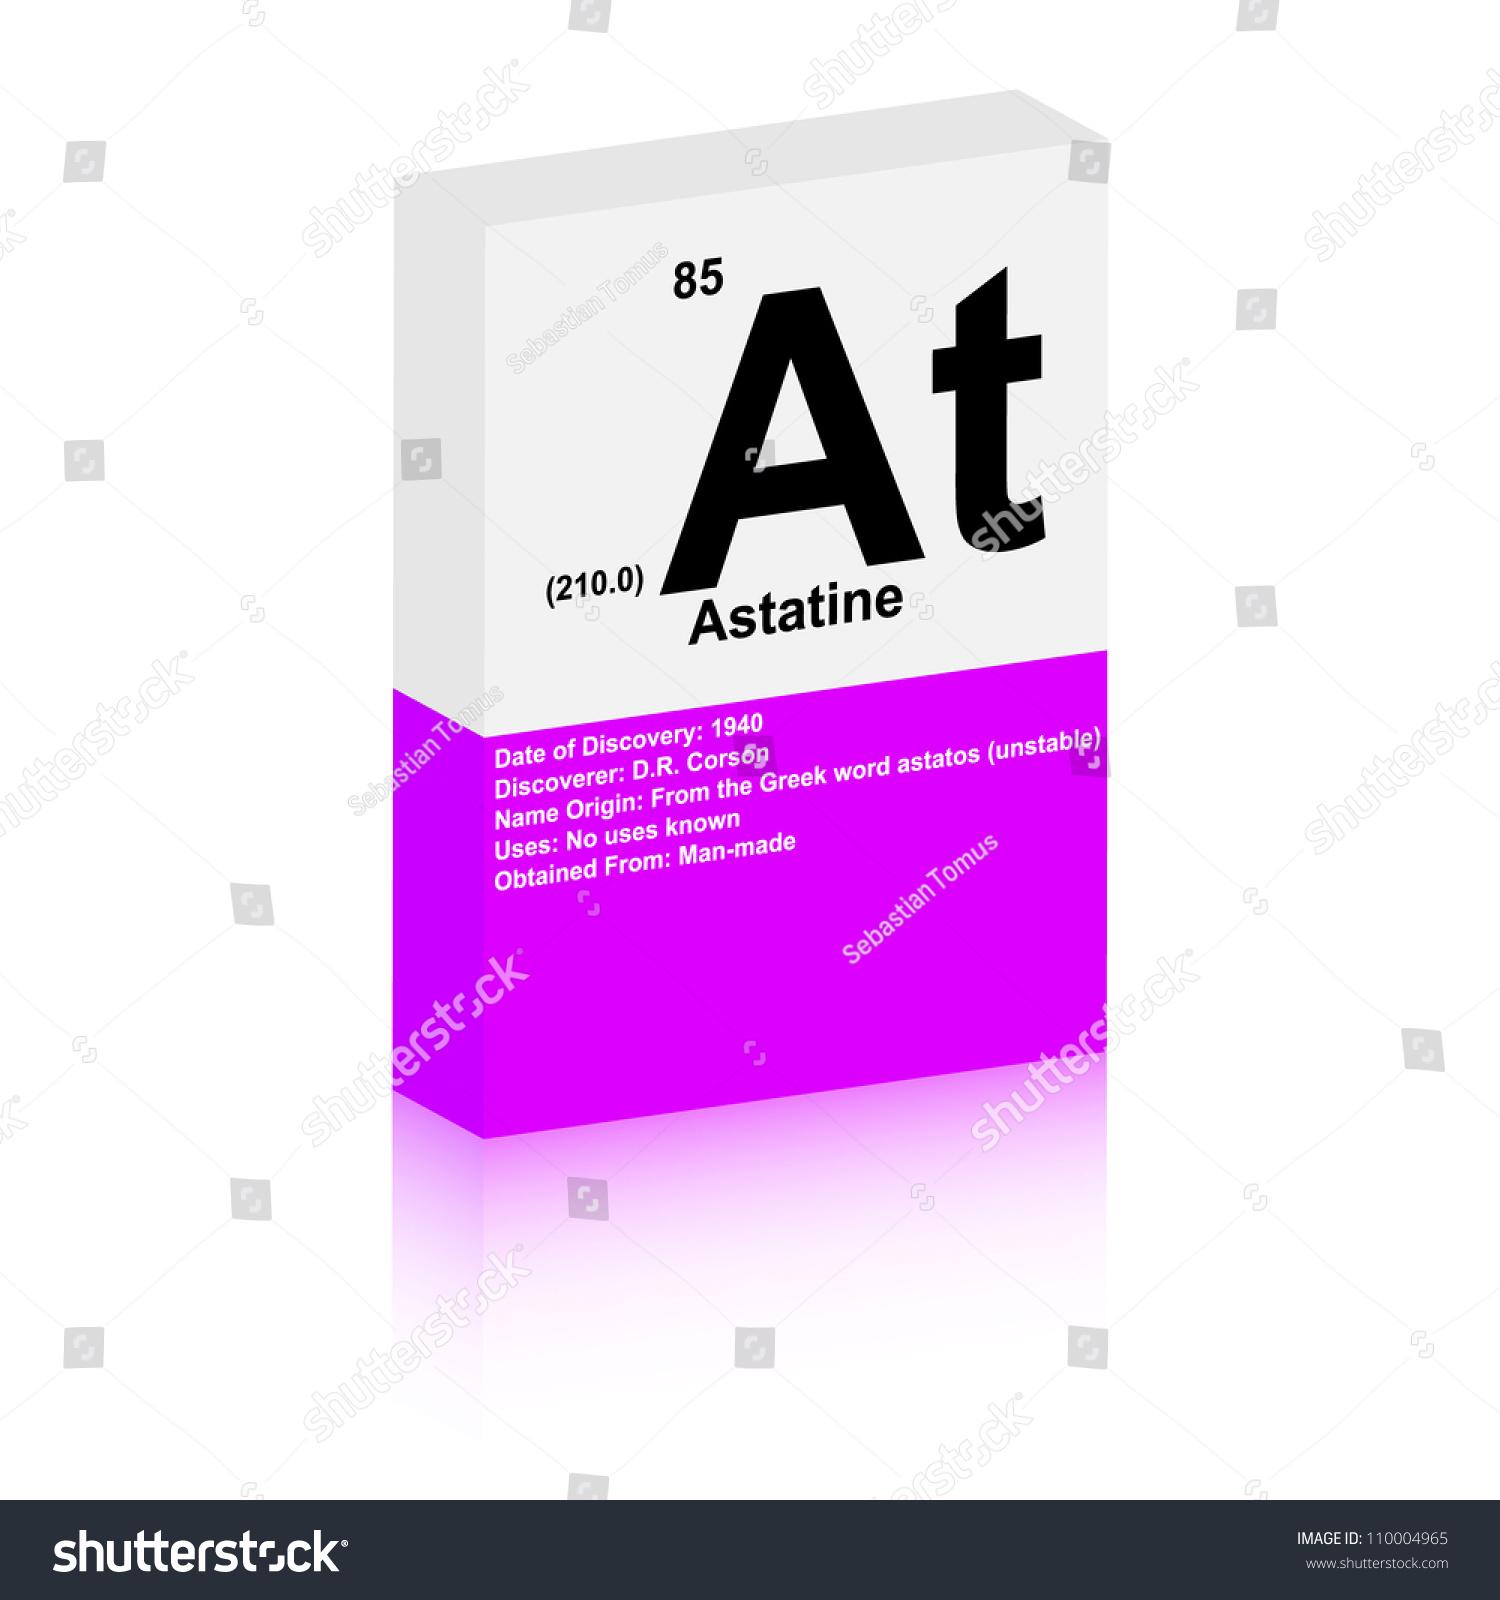 Astatine symbol stock vector 110004965 shutterstock astatine symbol gamestrikefo Image collections